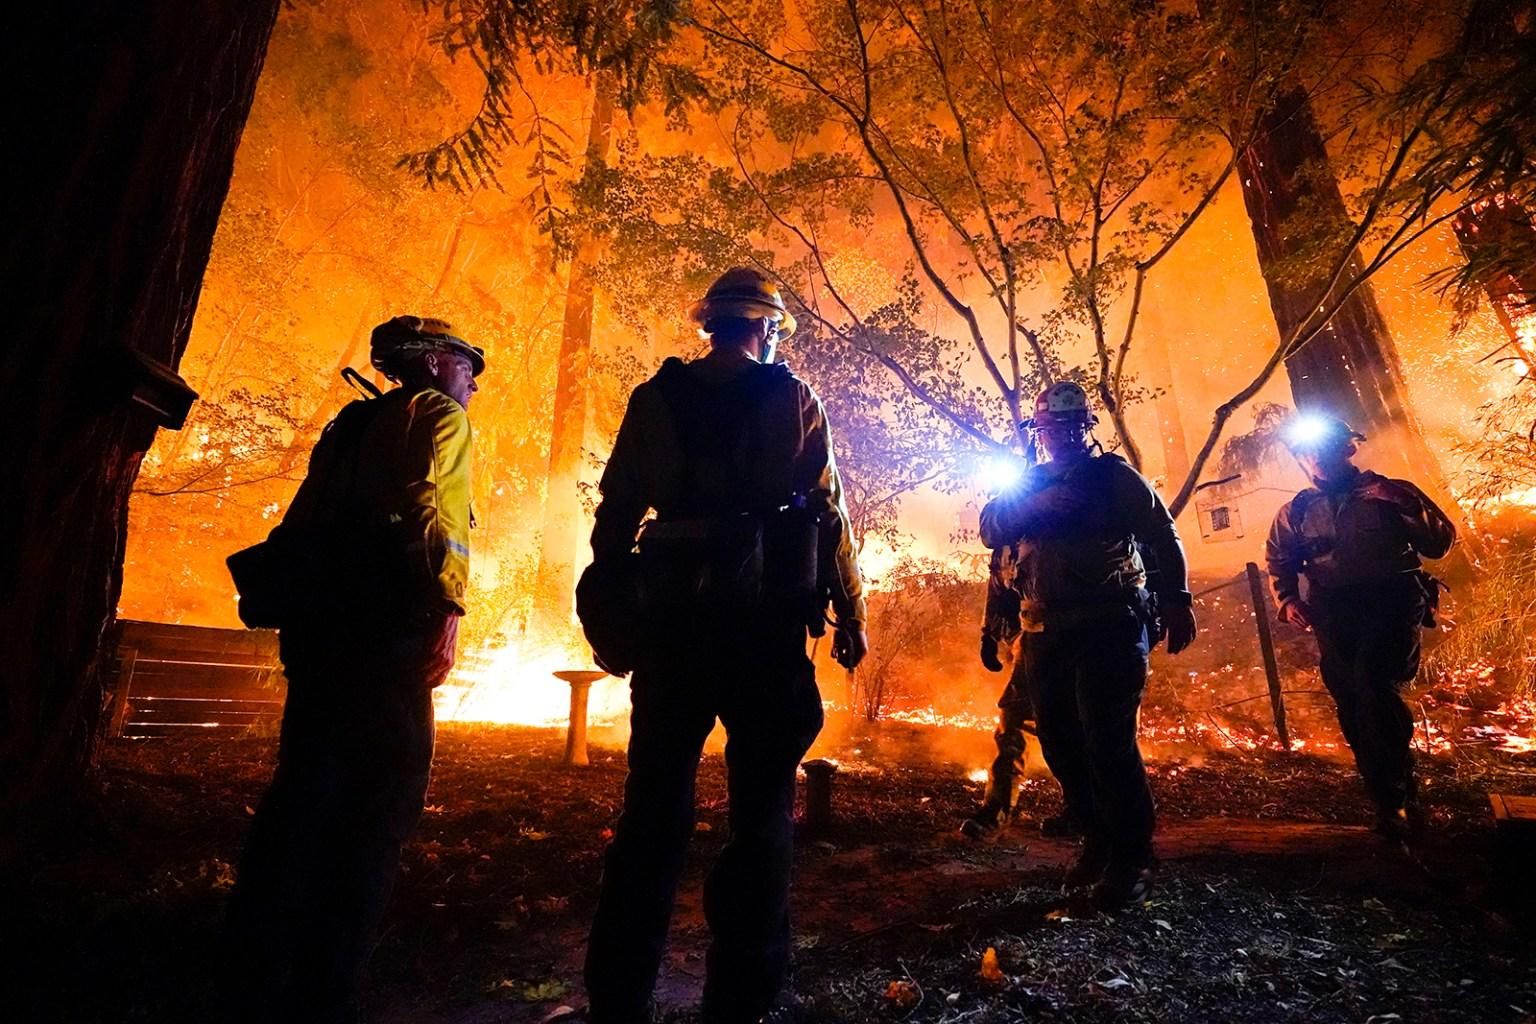 California's Wildfire Season Has Potential to Last Through Winter